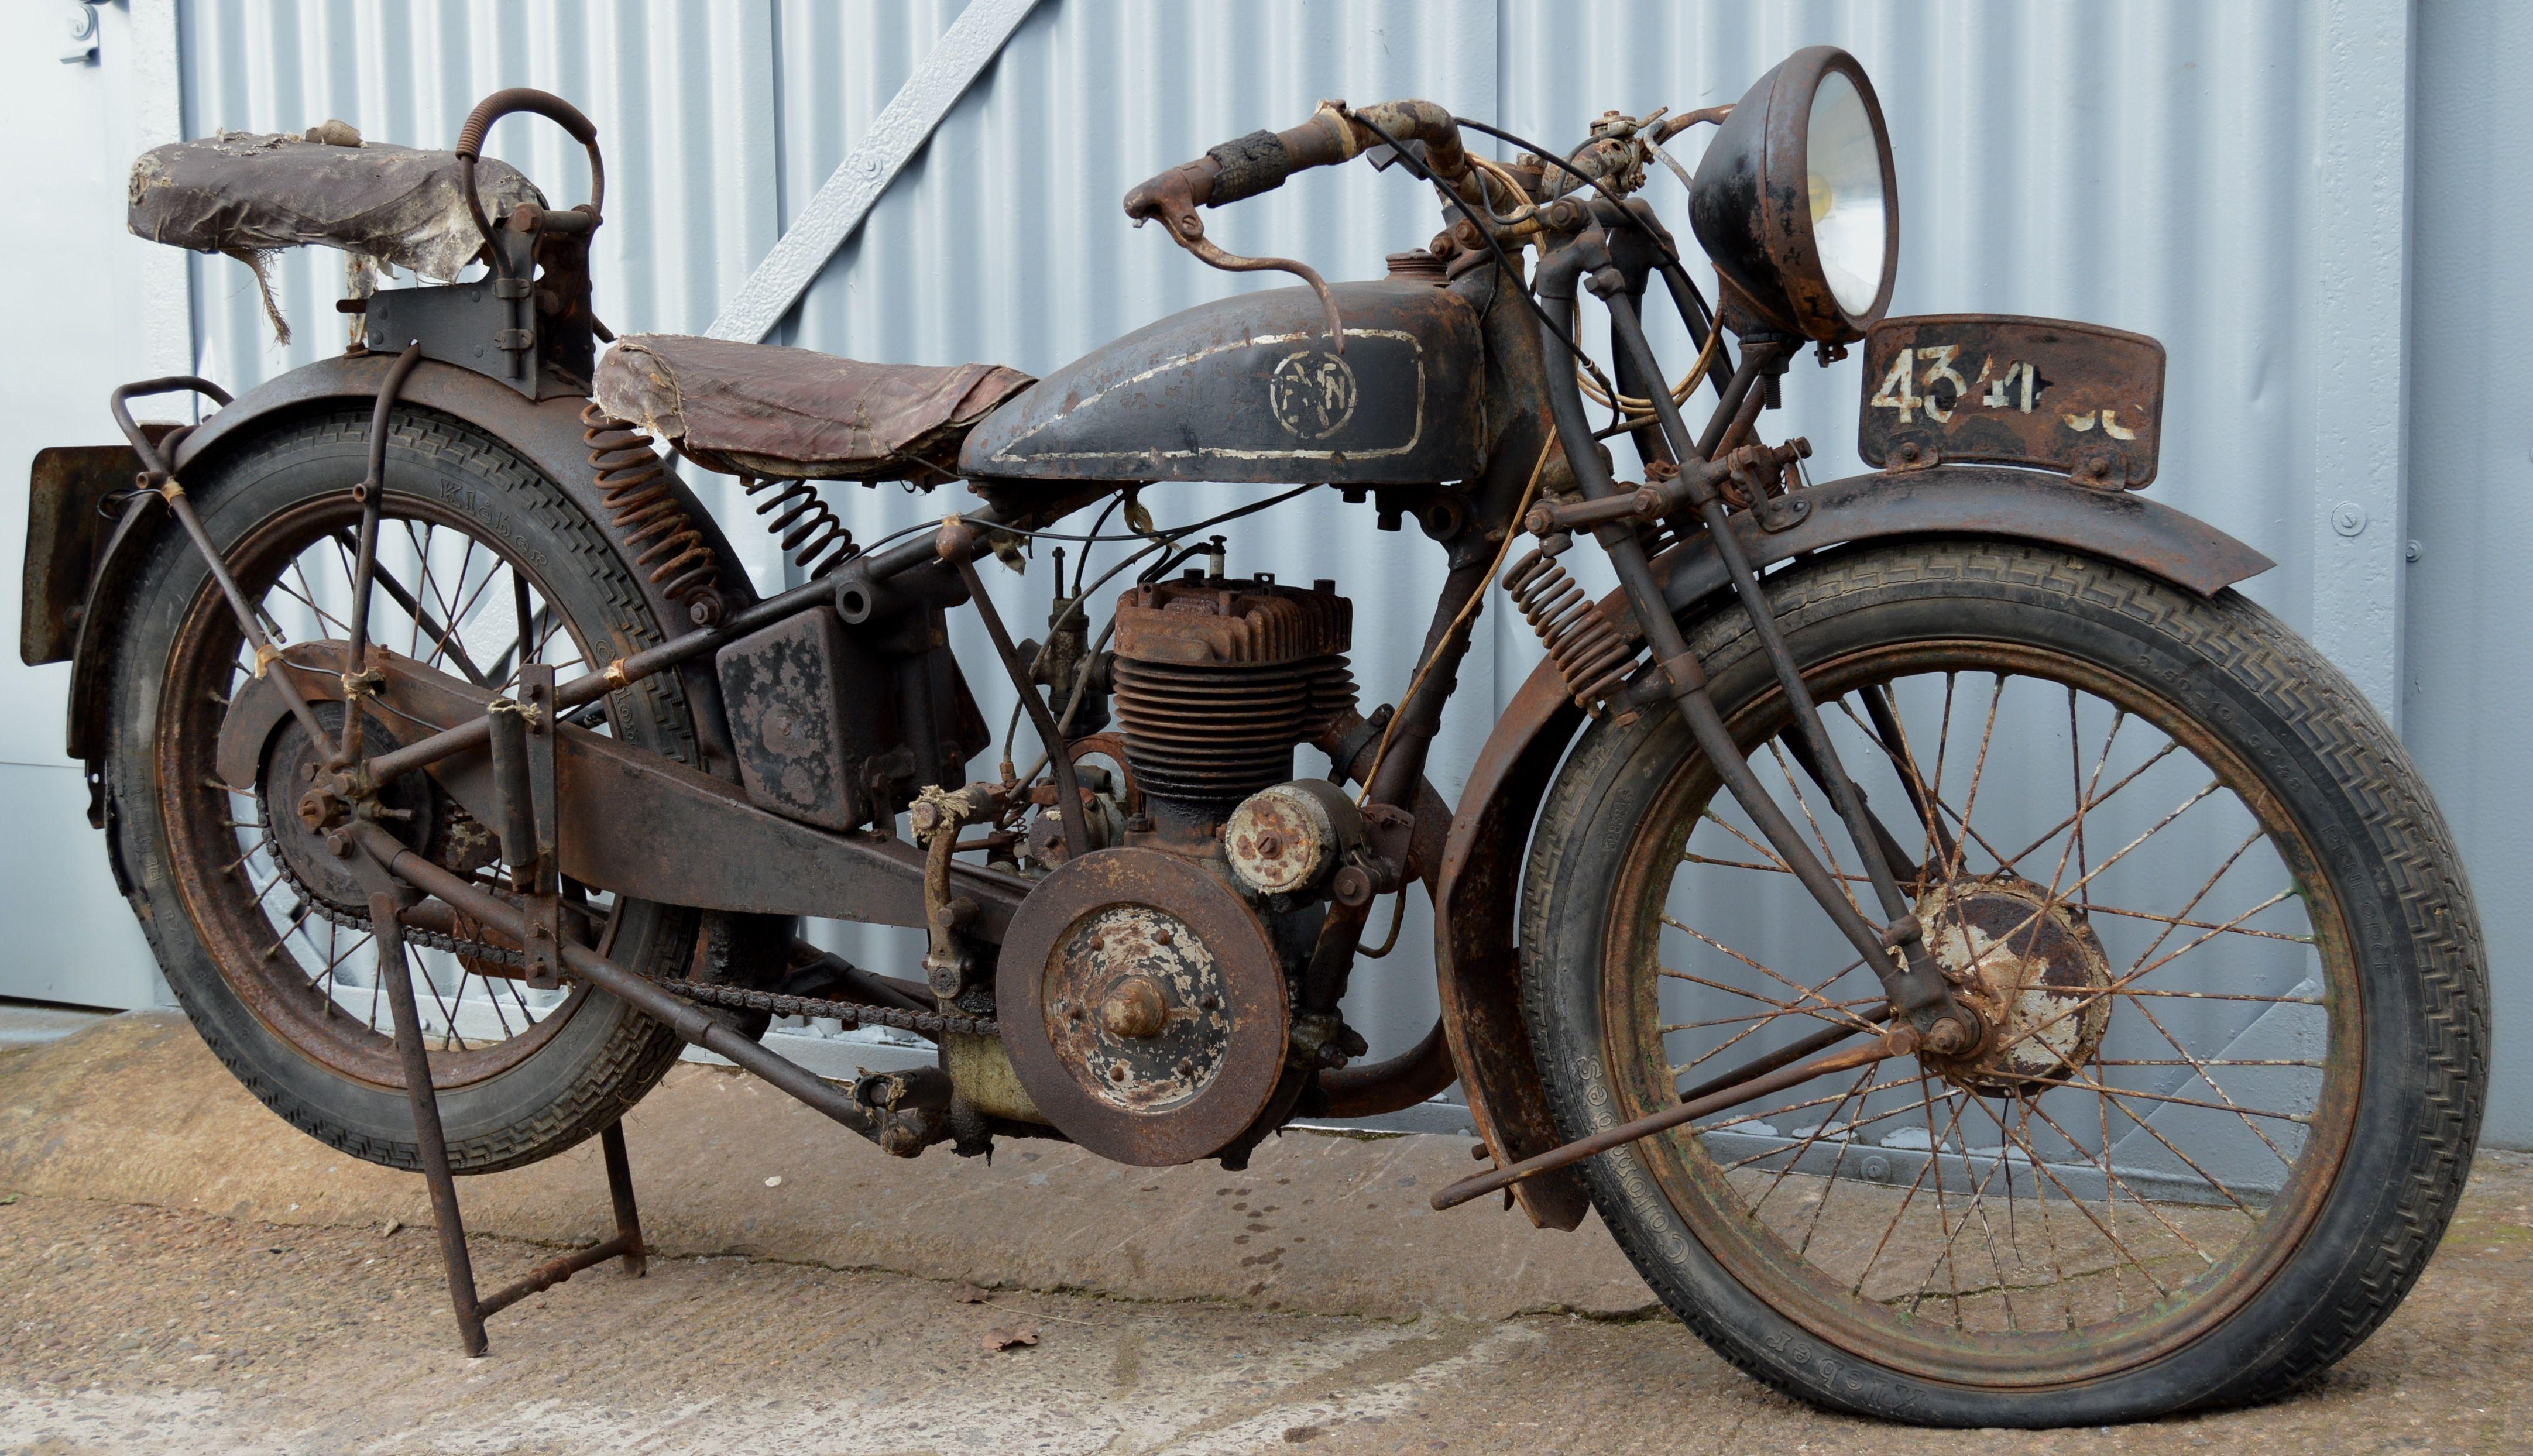 1928 fn m70 350cc 2995 motos antiguas pinterest motos et belge. Black Bedroom Furniture Sets. Home Design Ideas